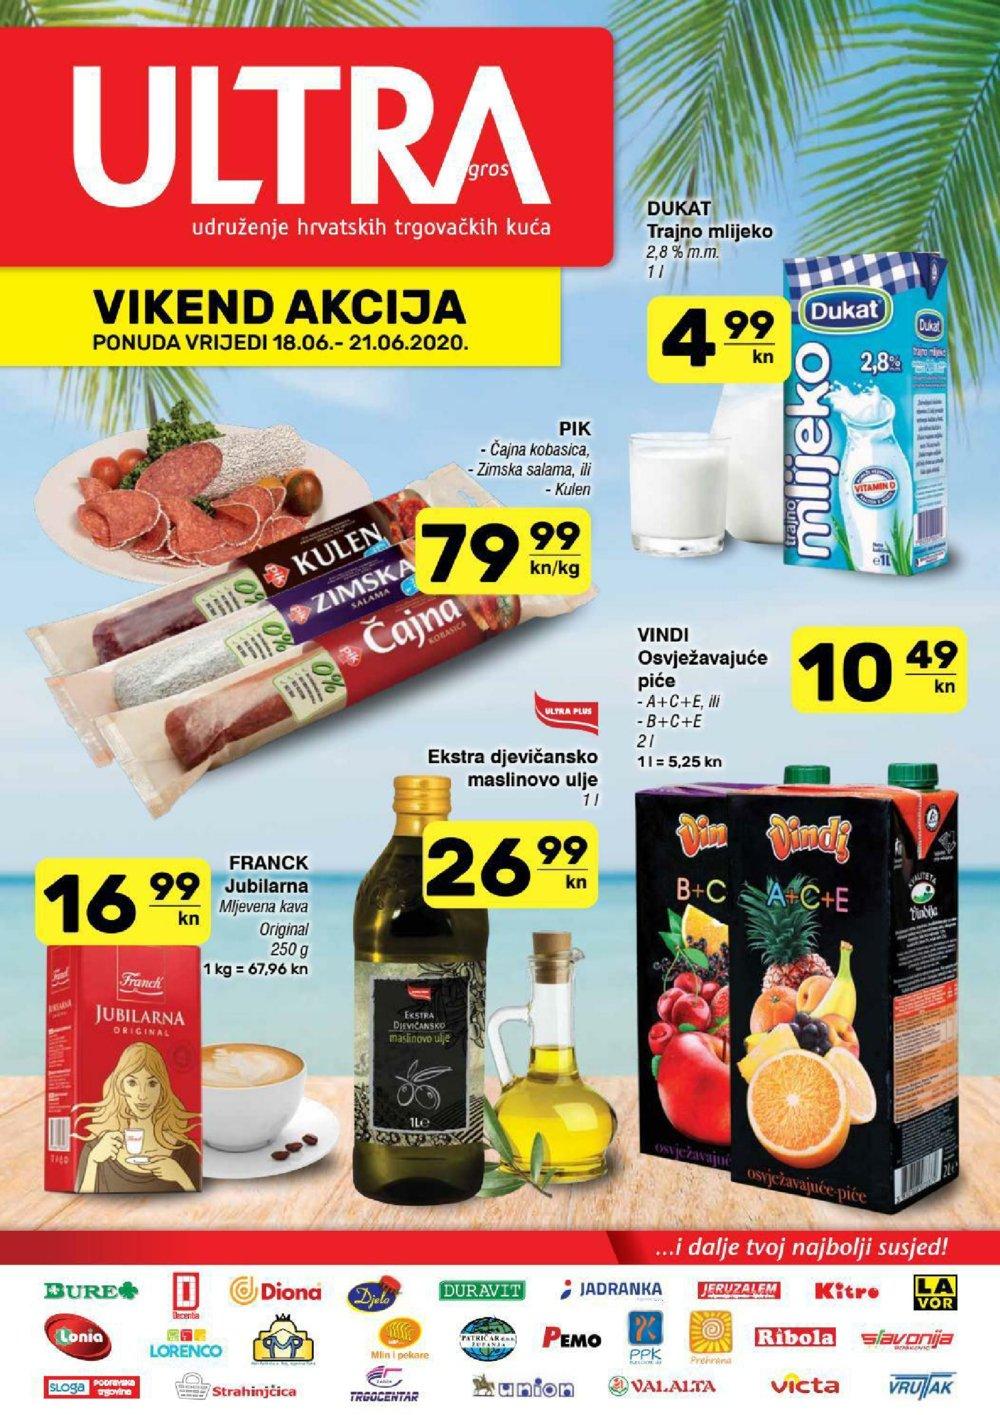 Prehrana katalog Ultra gros Vikend Akcija 18.06.-21.06.2020.